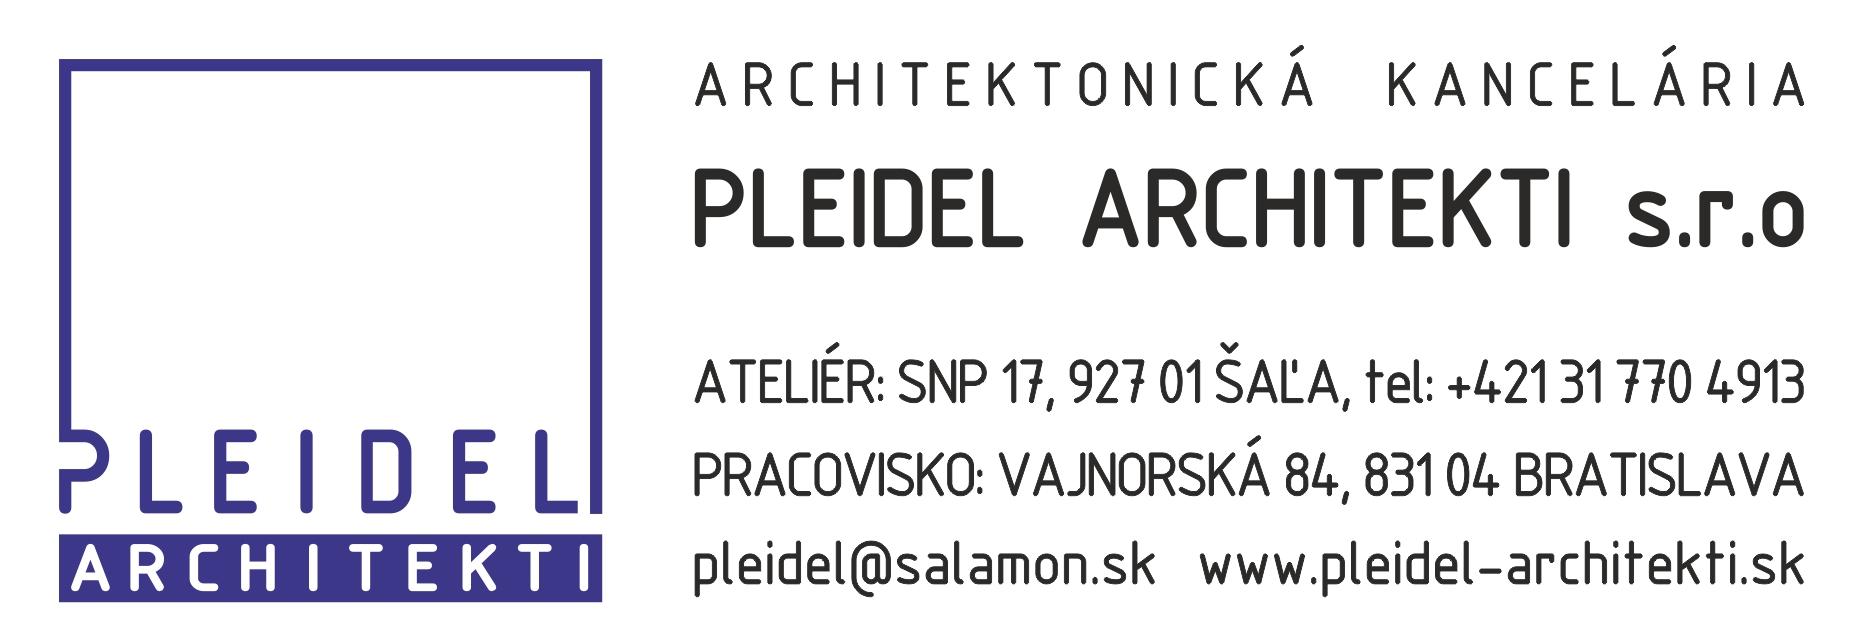 PLEIDEL ARCHITEKTI s.r.o